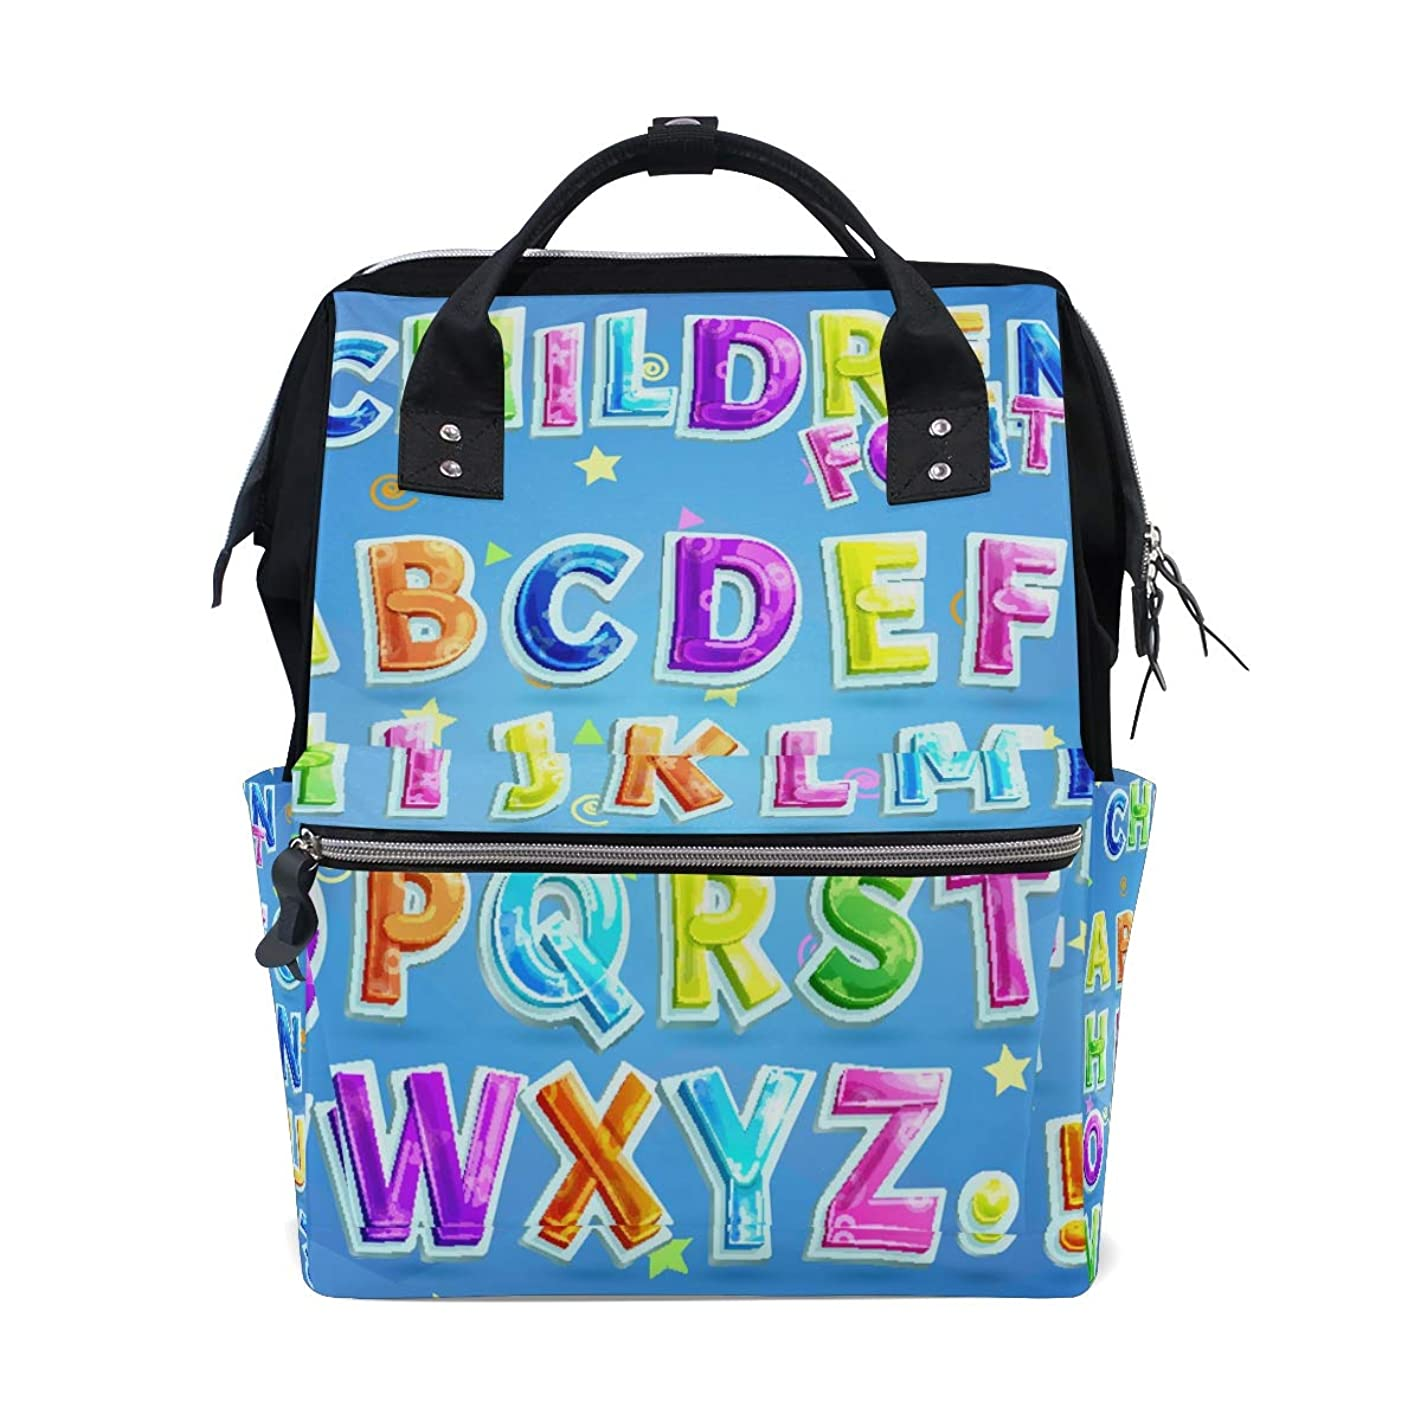 Blue English Capital Letters Alphabet School Backpack Large Capacity Mummy Bags Laptop Handbag Casual Travel Rucksack Satchel For Women Men Adult Teen Children